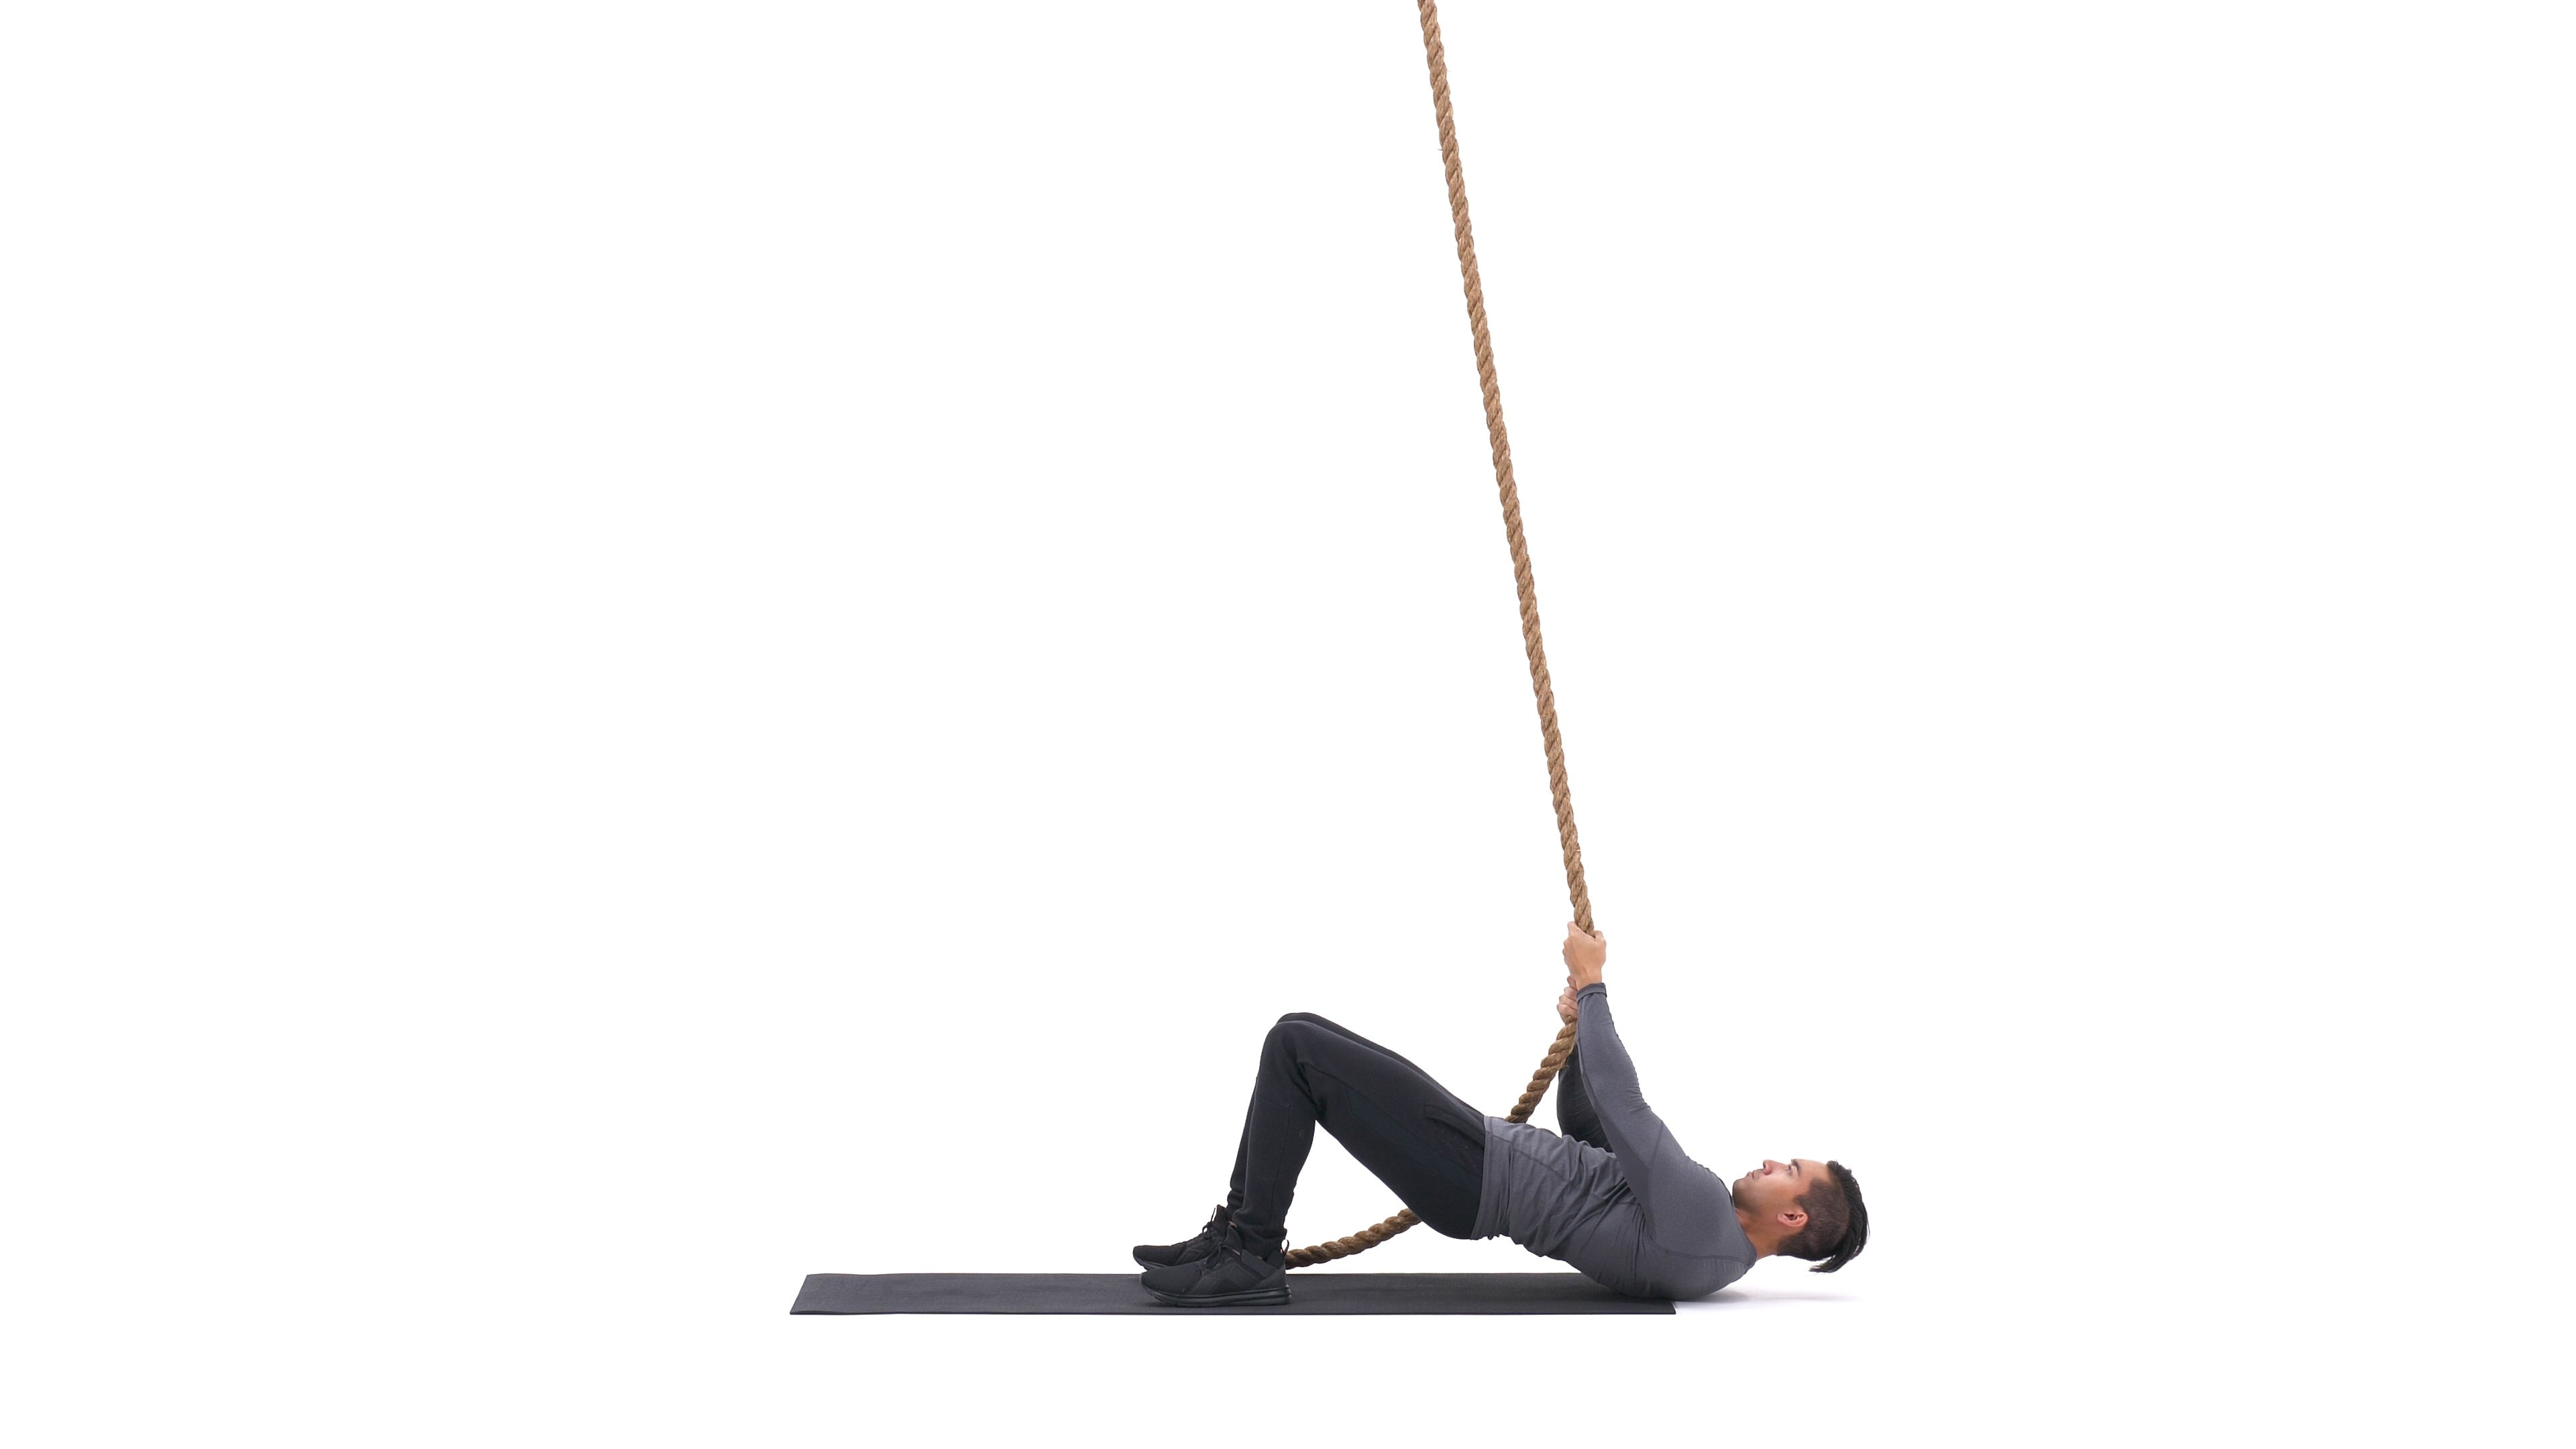 Floor rope climb image